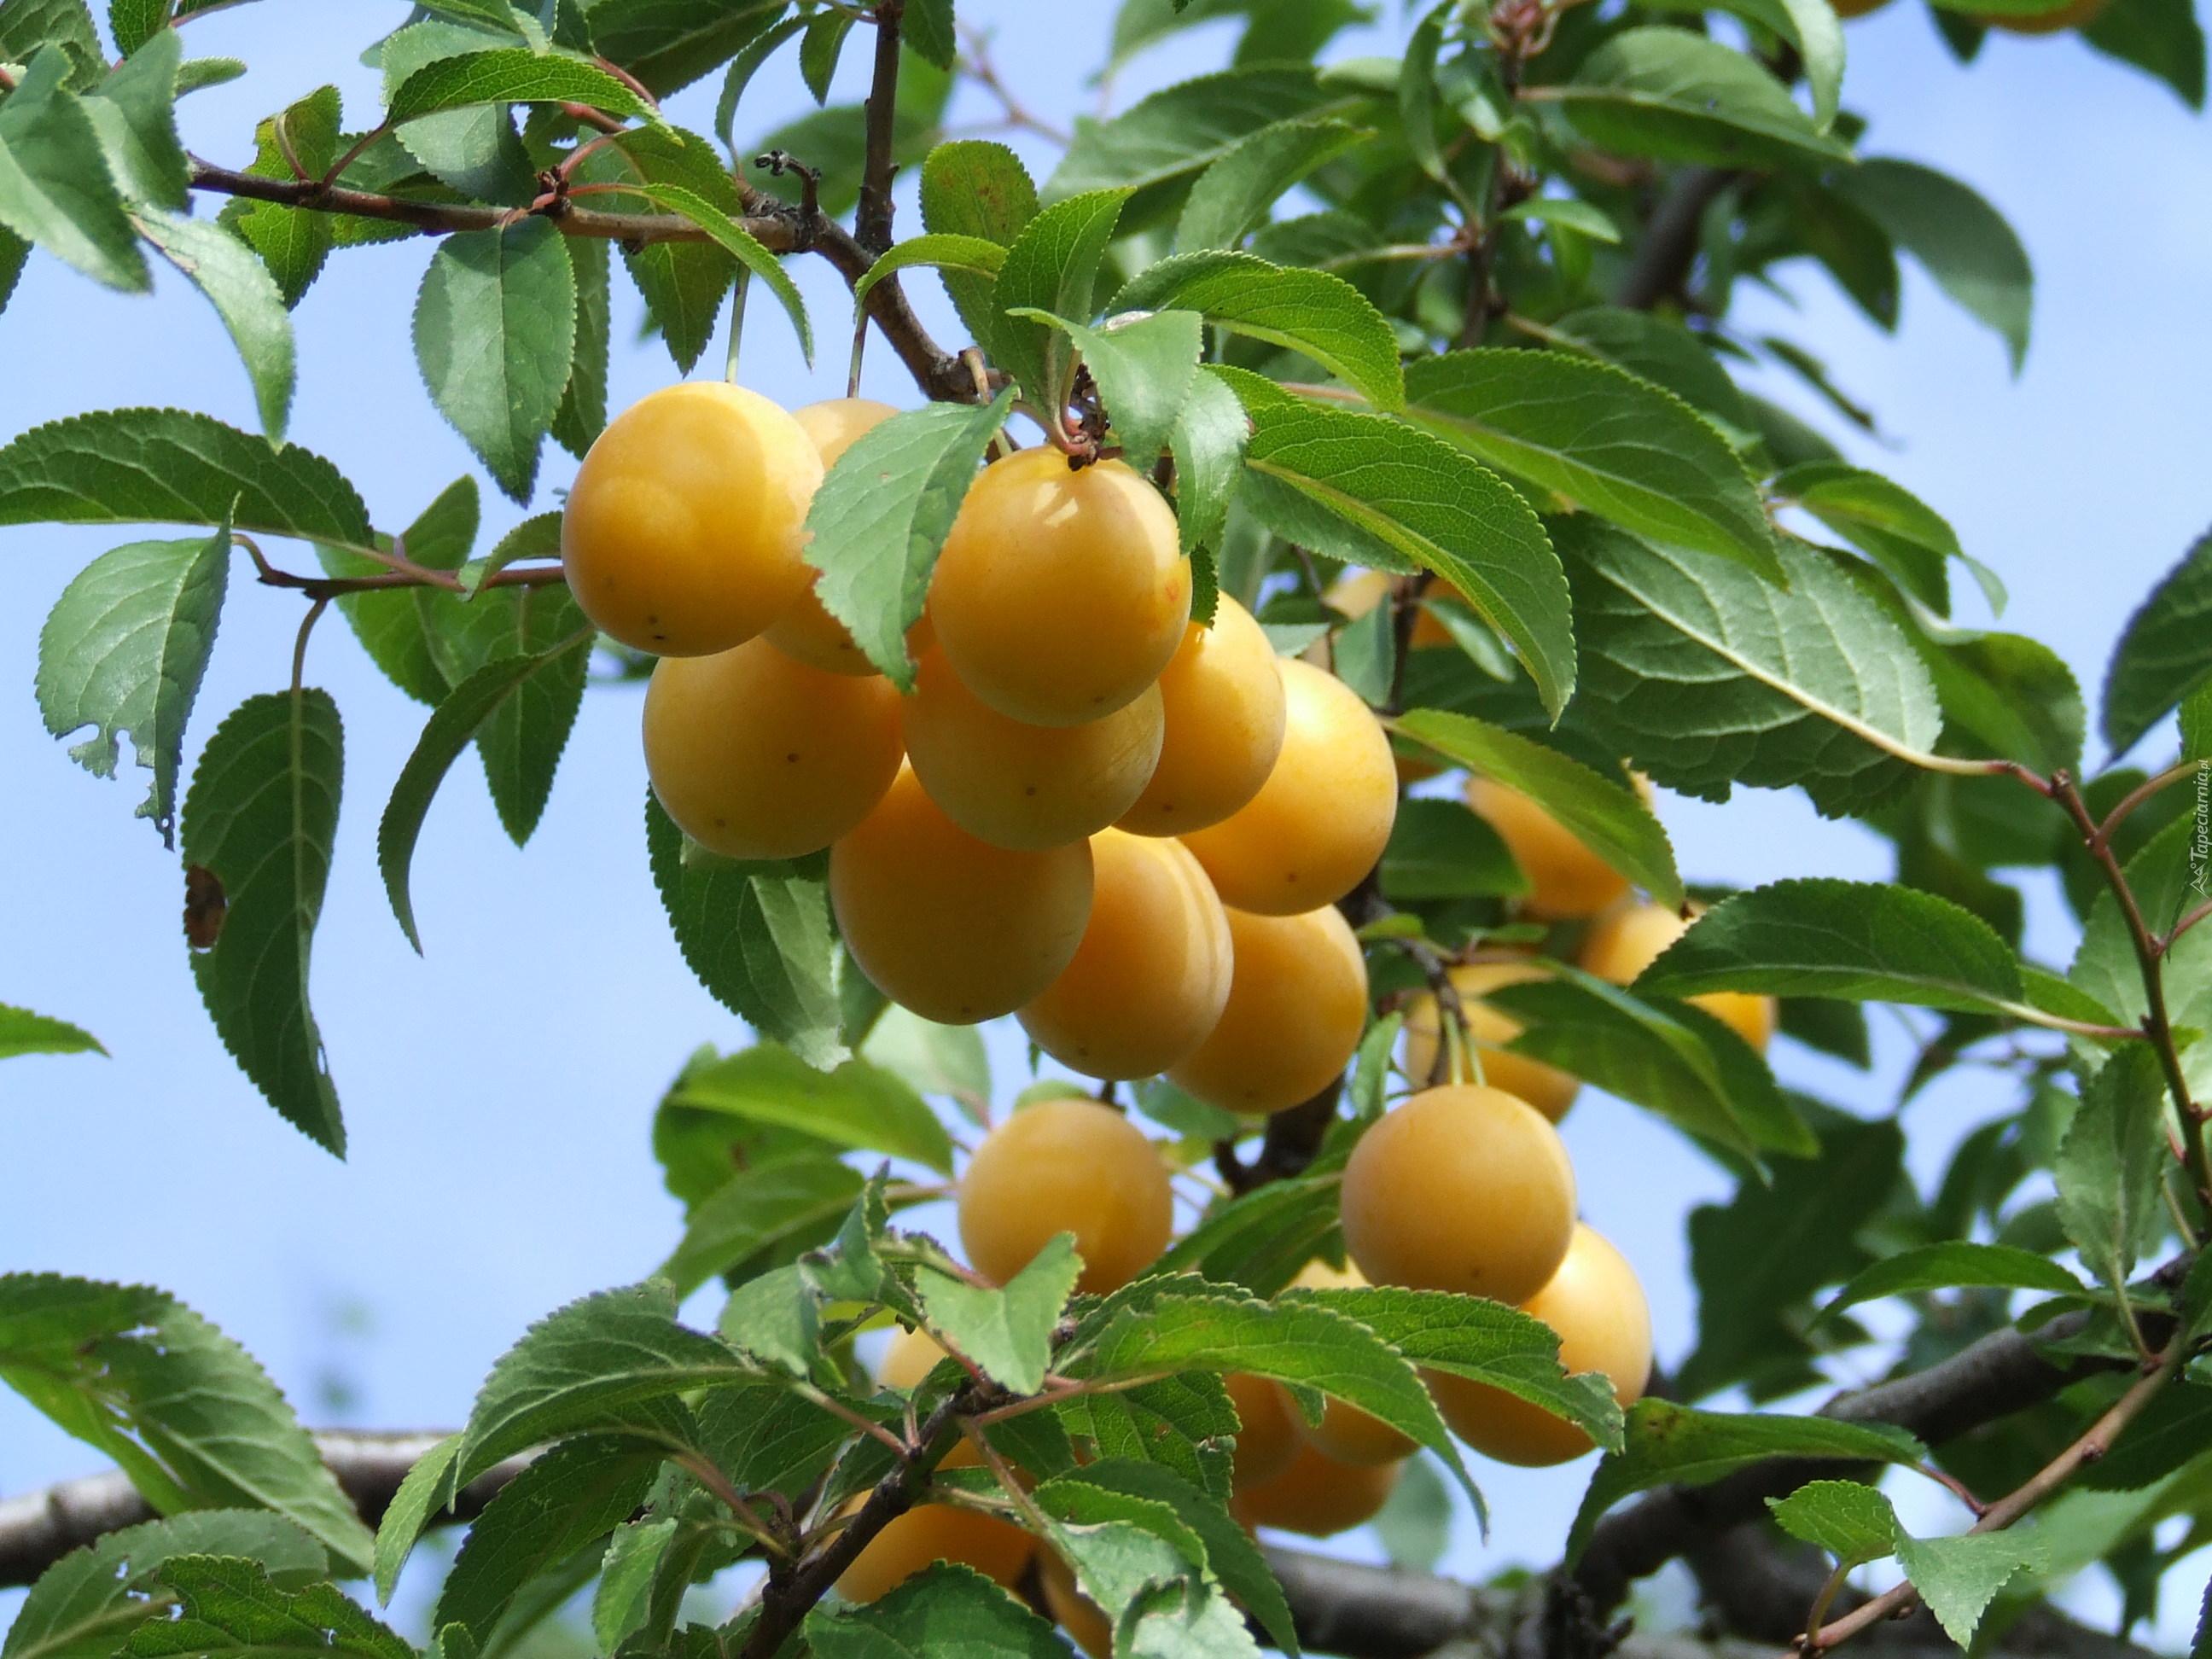 Owoce liwka mirabelka drzewo for Albero di kiwi